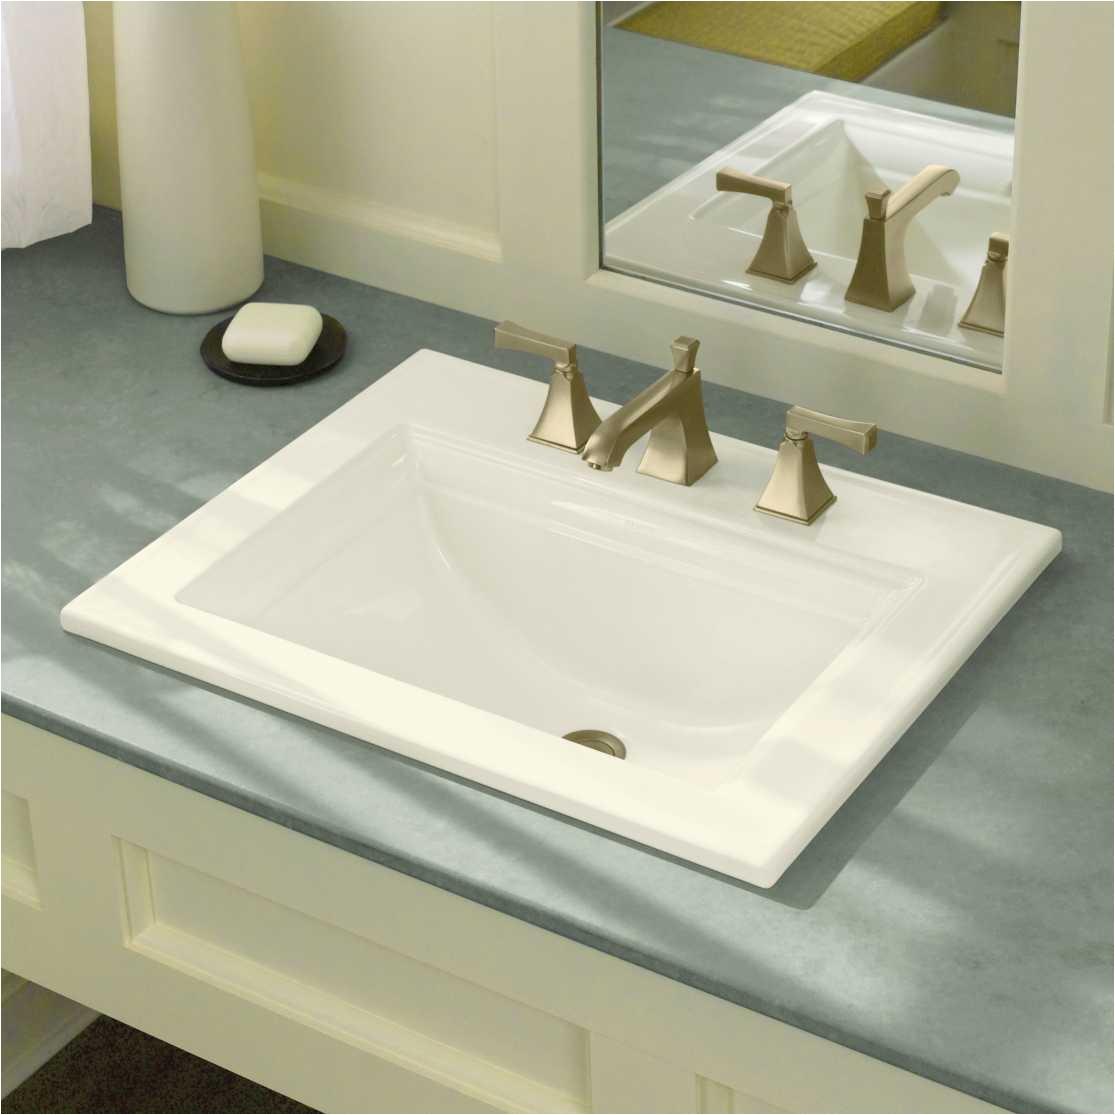 walk in bathtub lowes toilets lowes 0d design ideas of walk in showers lowes